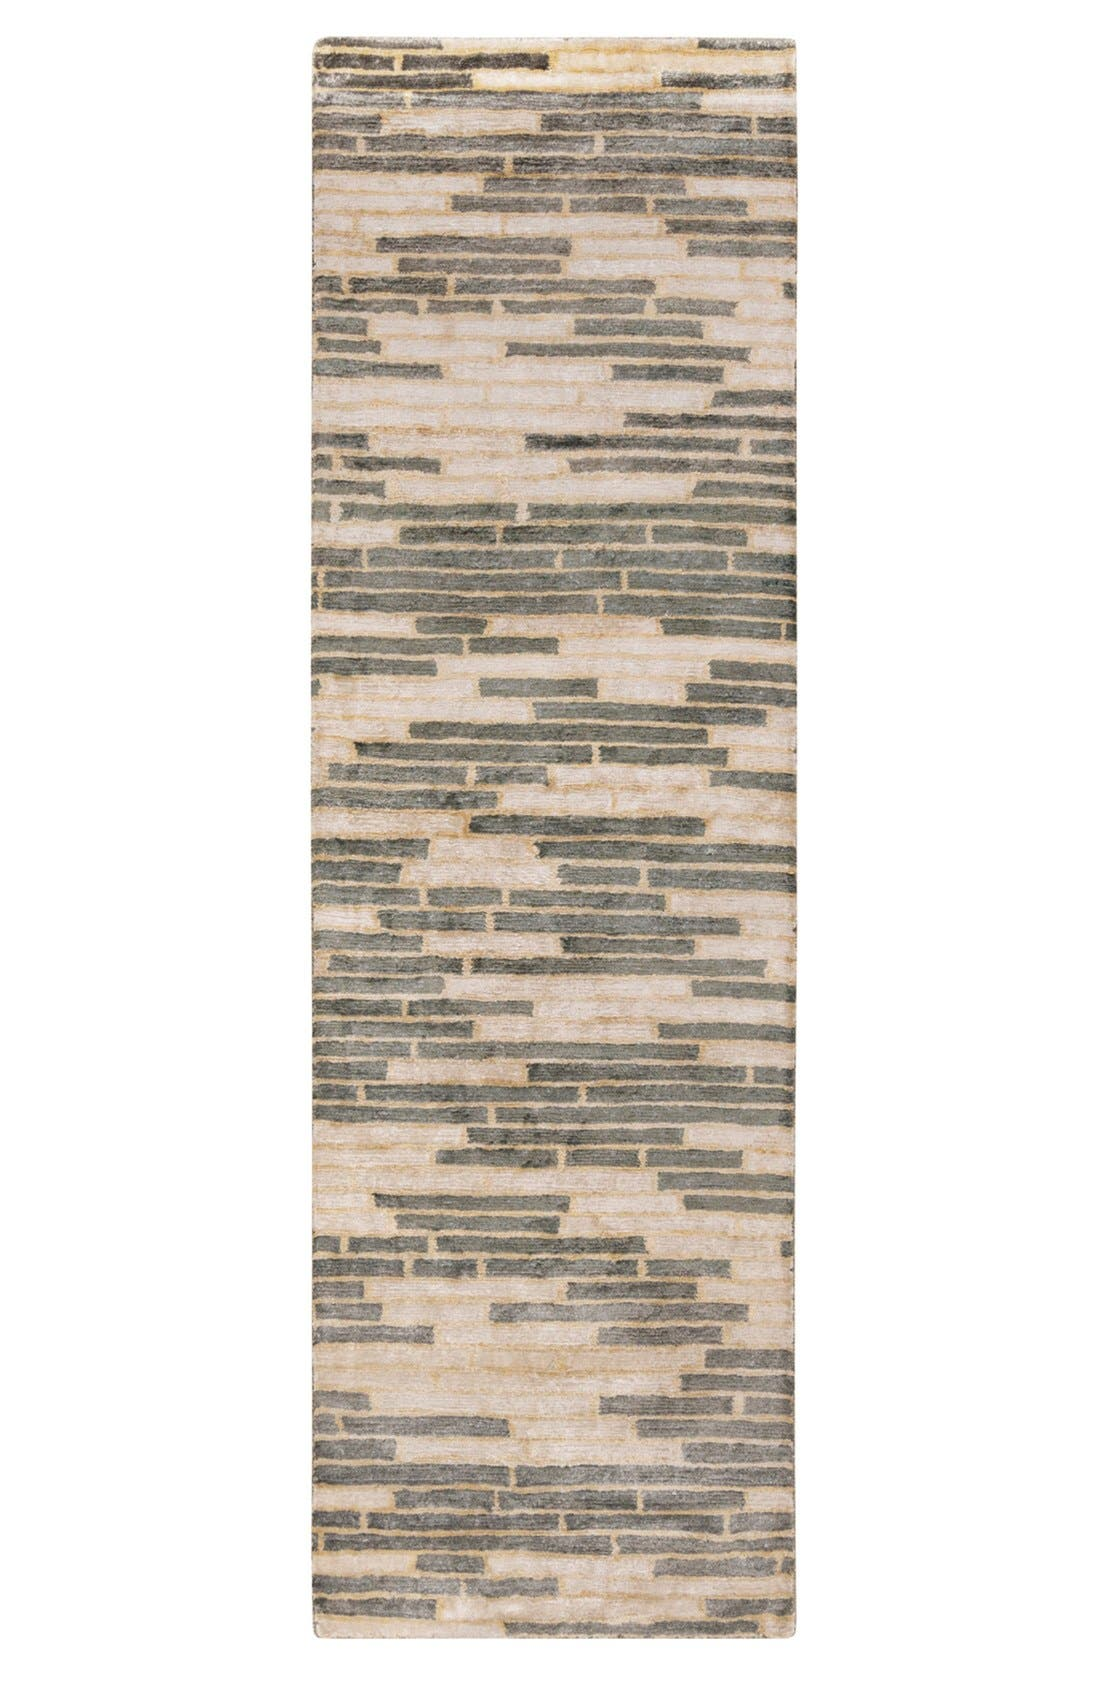 'Platinum' Hand Tufted Rug,                             Alternate thumbnail 2, color,                             CHARCOAL/ BEIGE/ IVORY